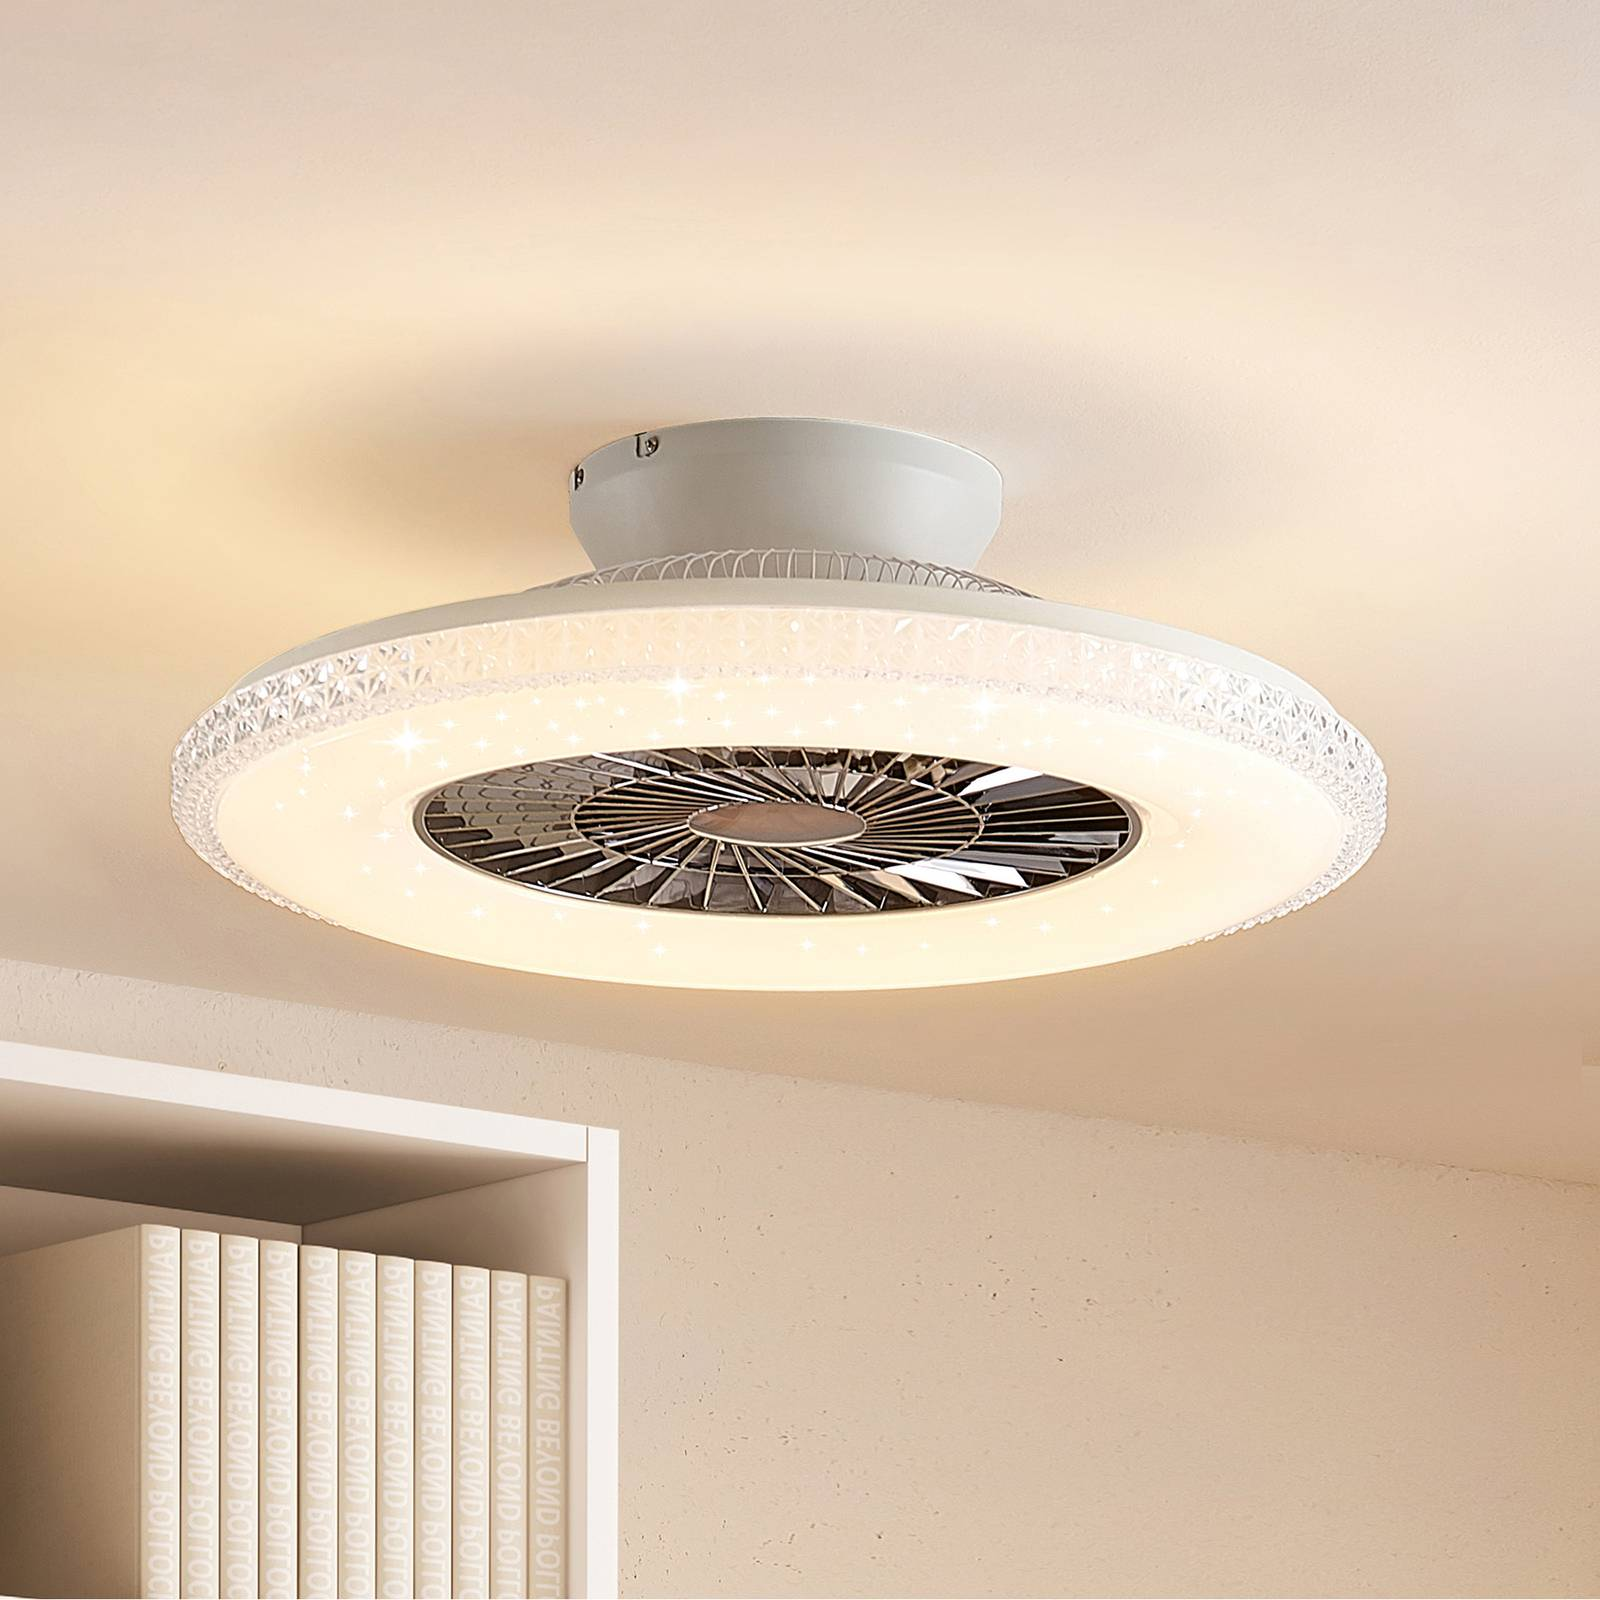 Starluna Ordanio LED-loftventilator med lys